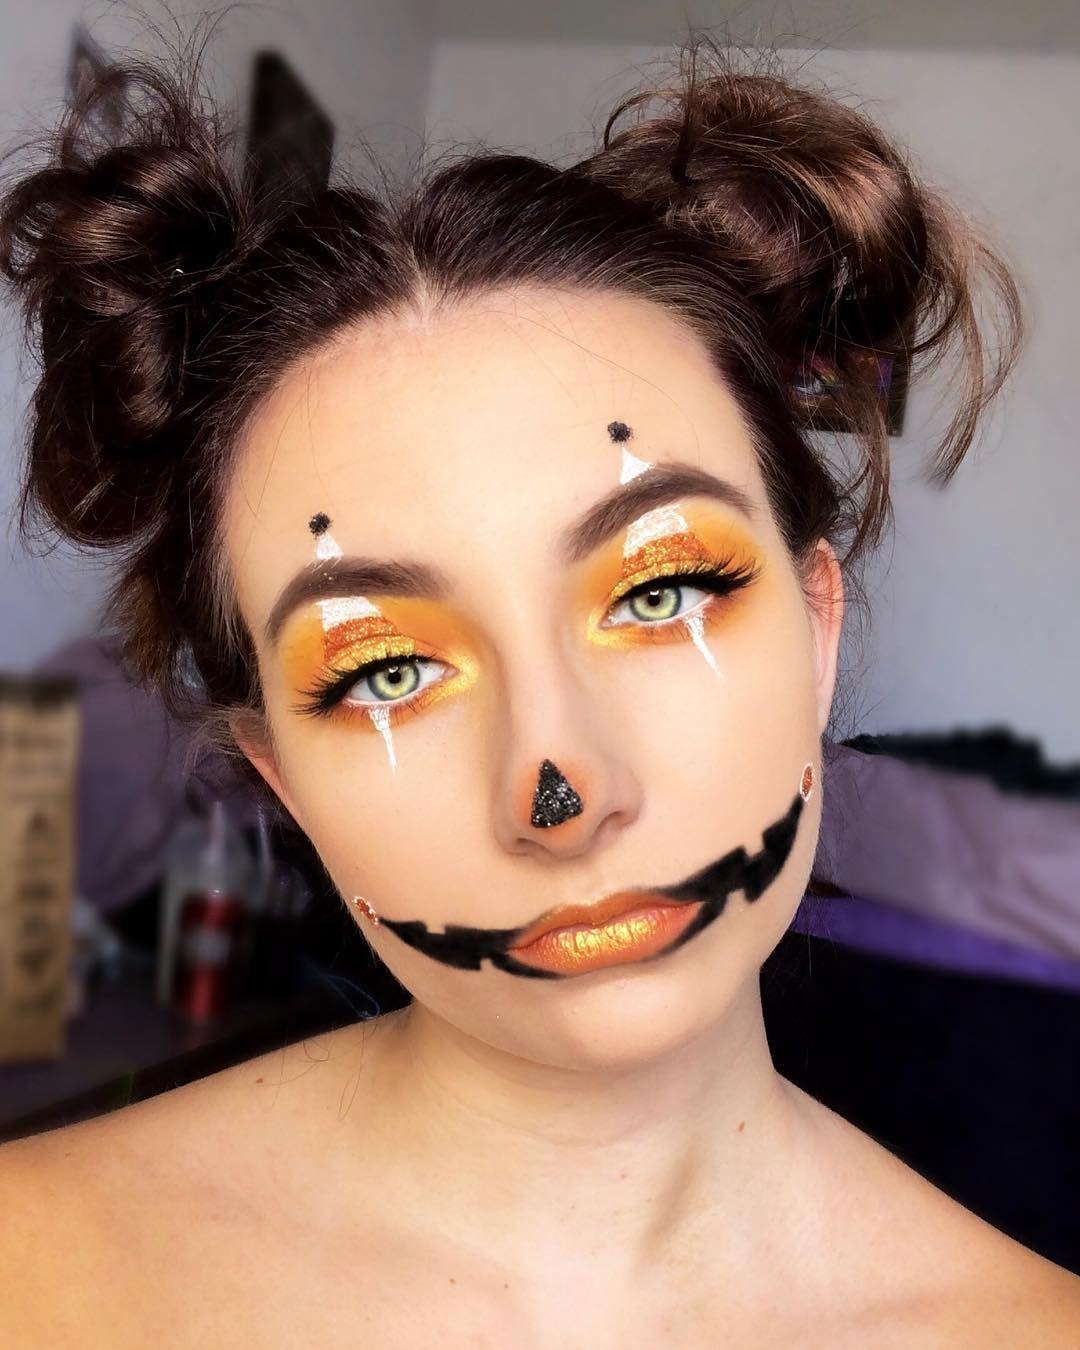 Candy corn face 🎃 Las Vegas Makeup Artist Check out